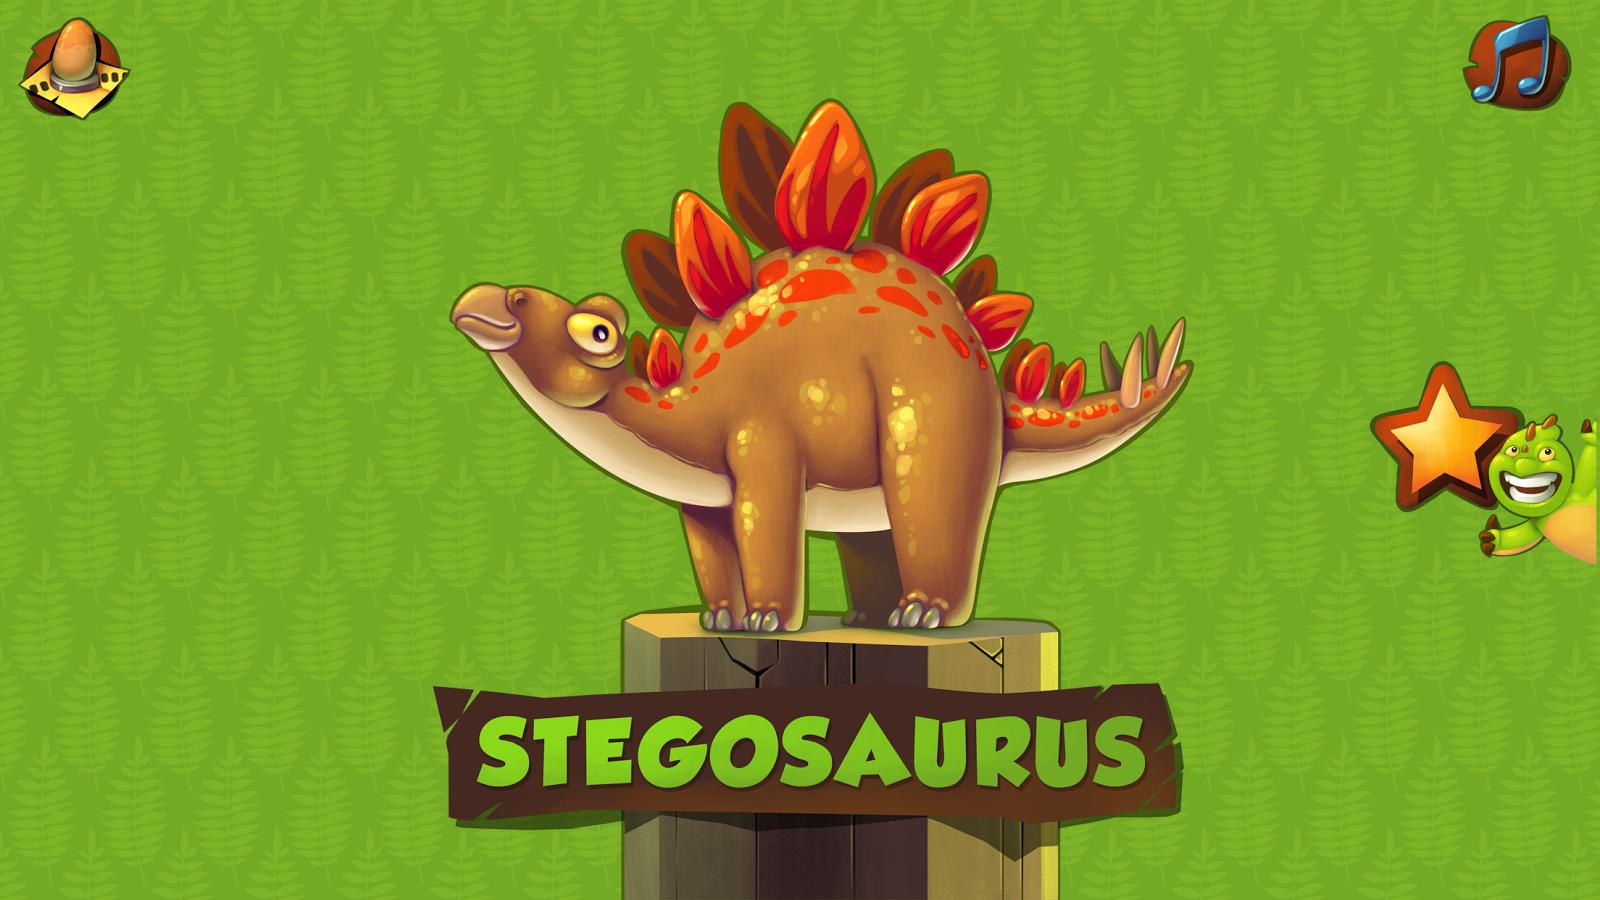 Dinoboom (kinder) Puzzles van 0,99 nu gratis @Google Playstore